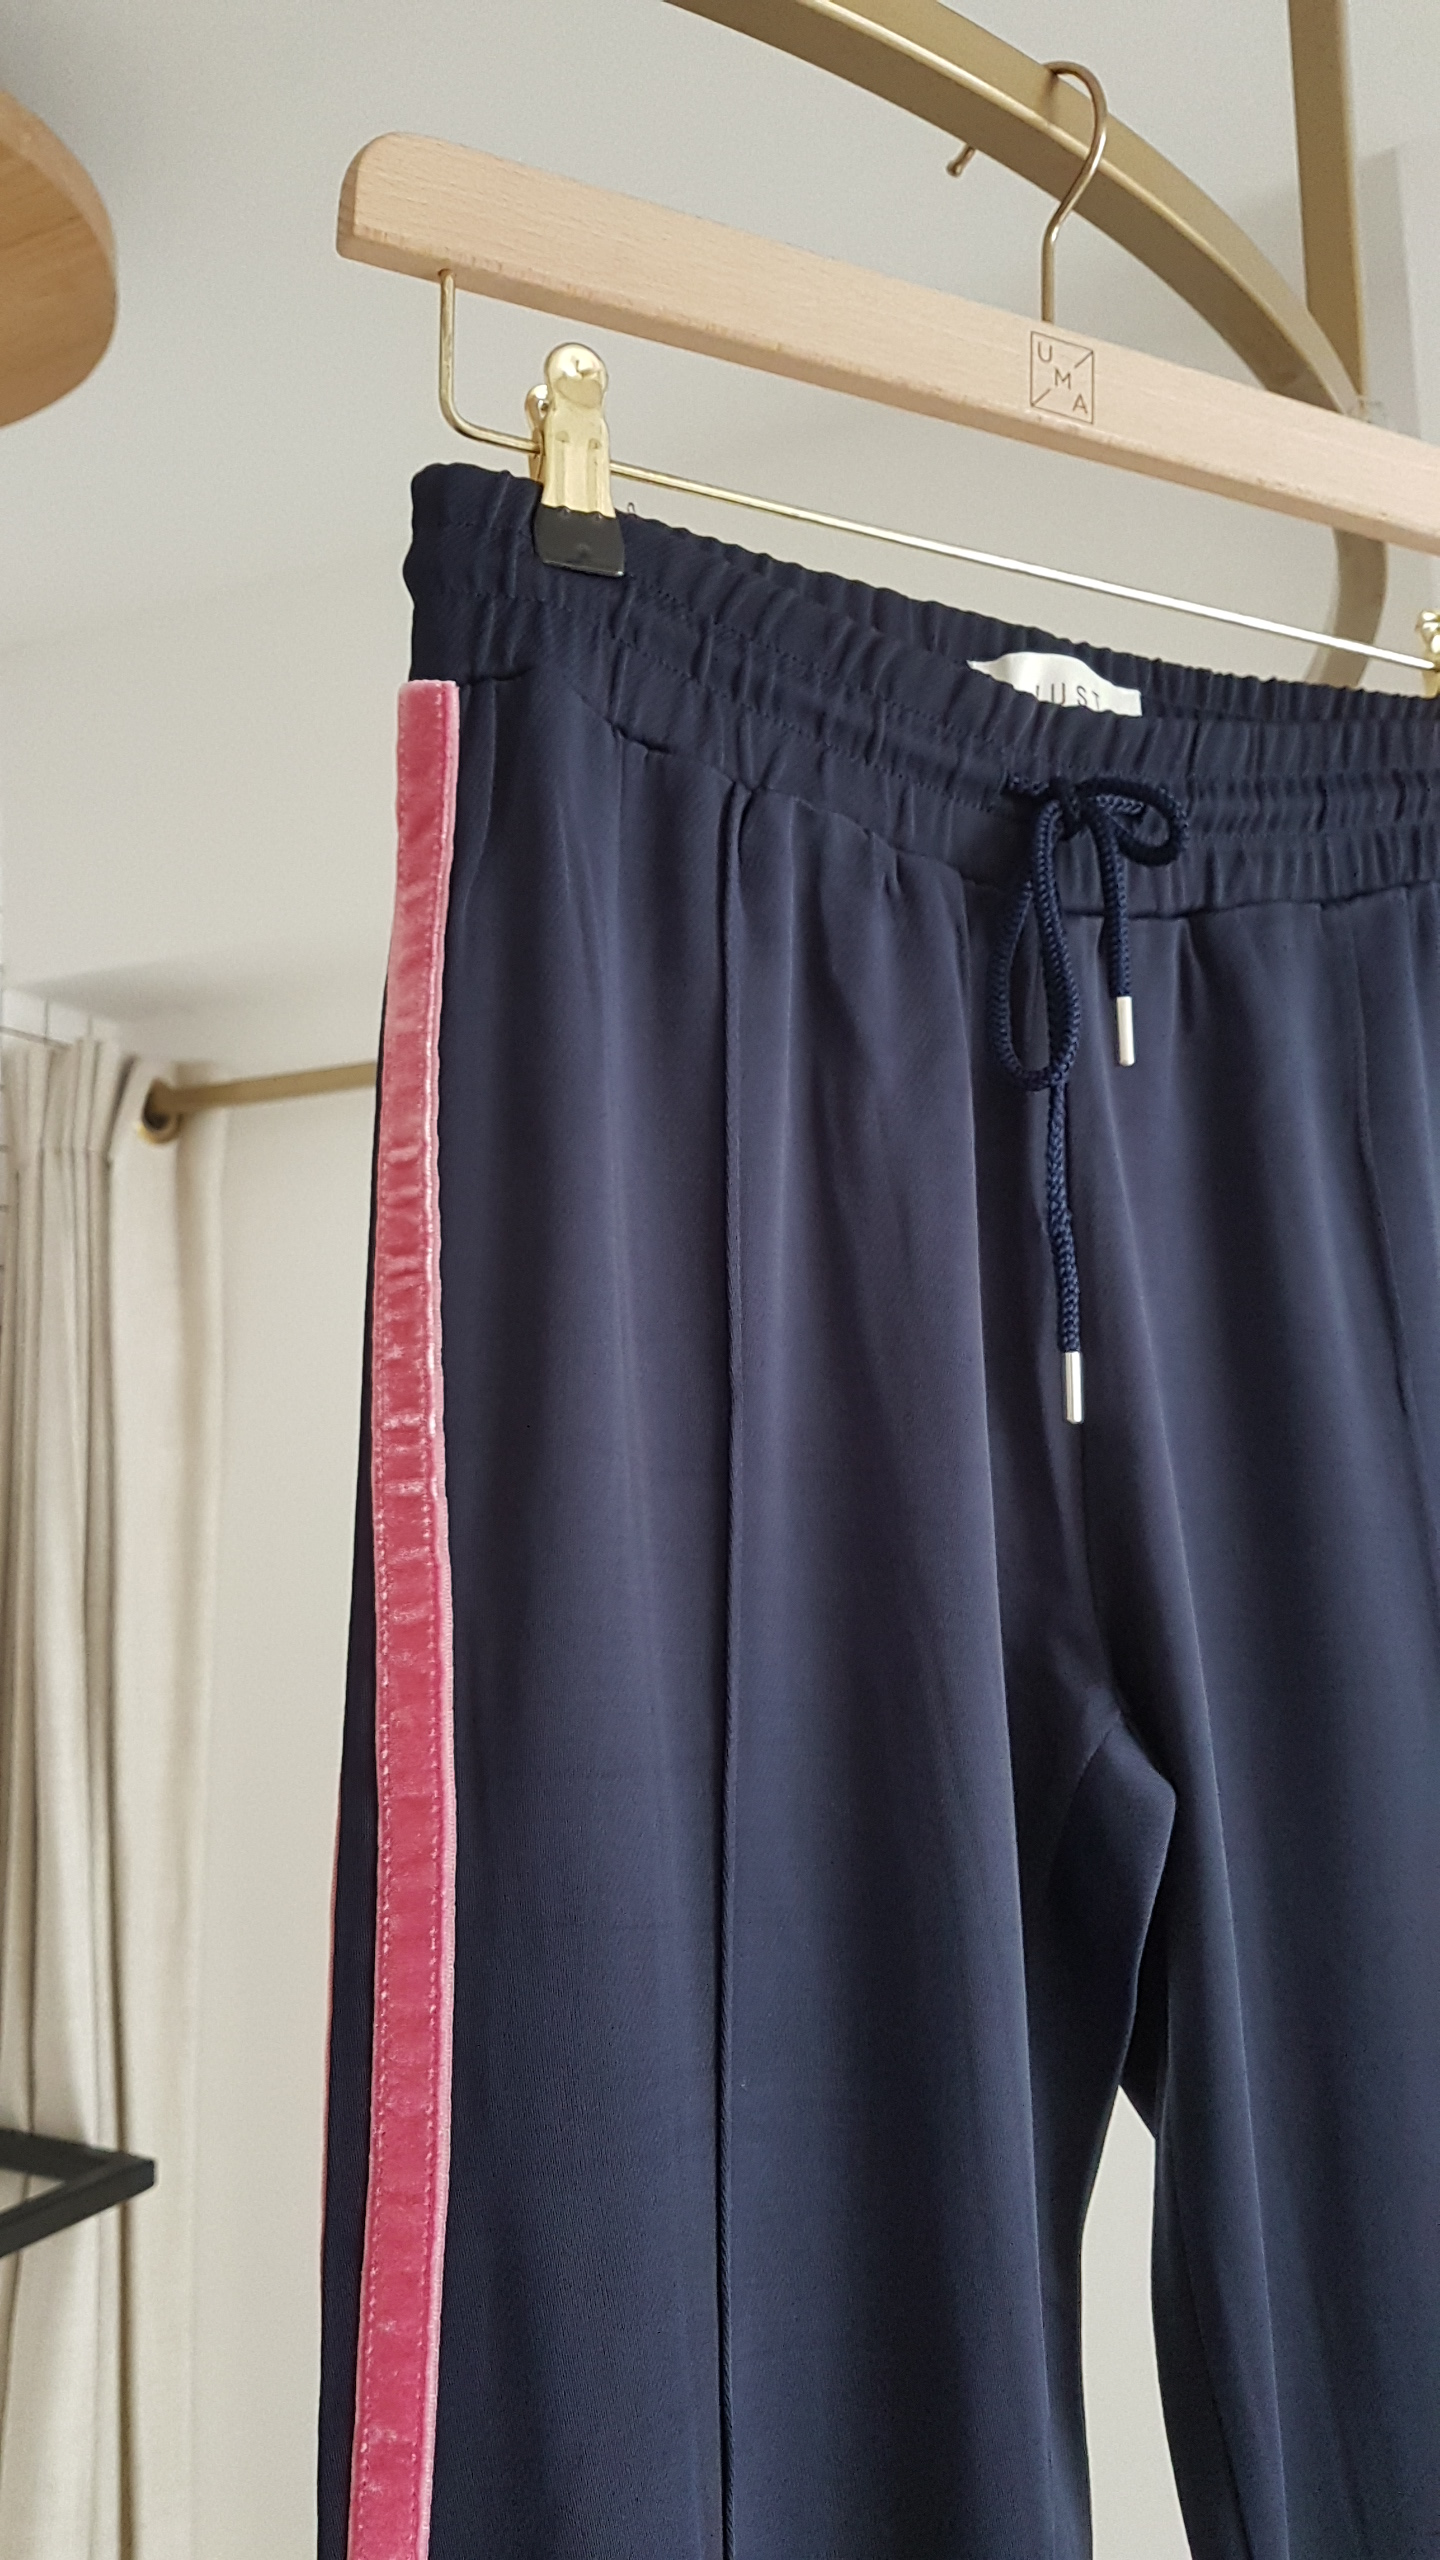 Harvey trousers